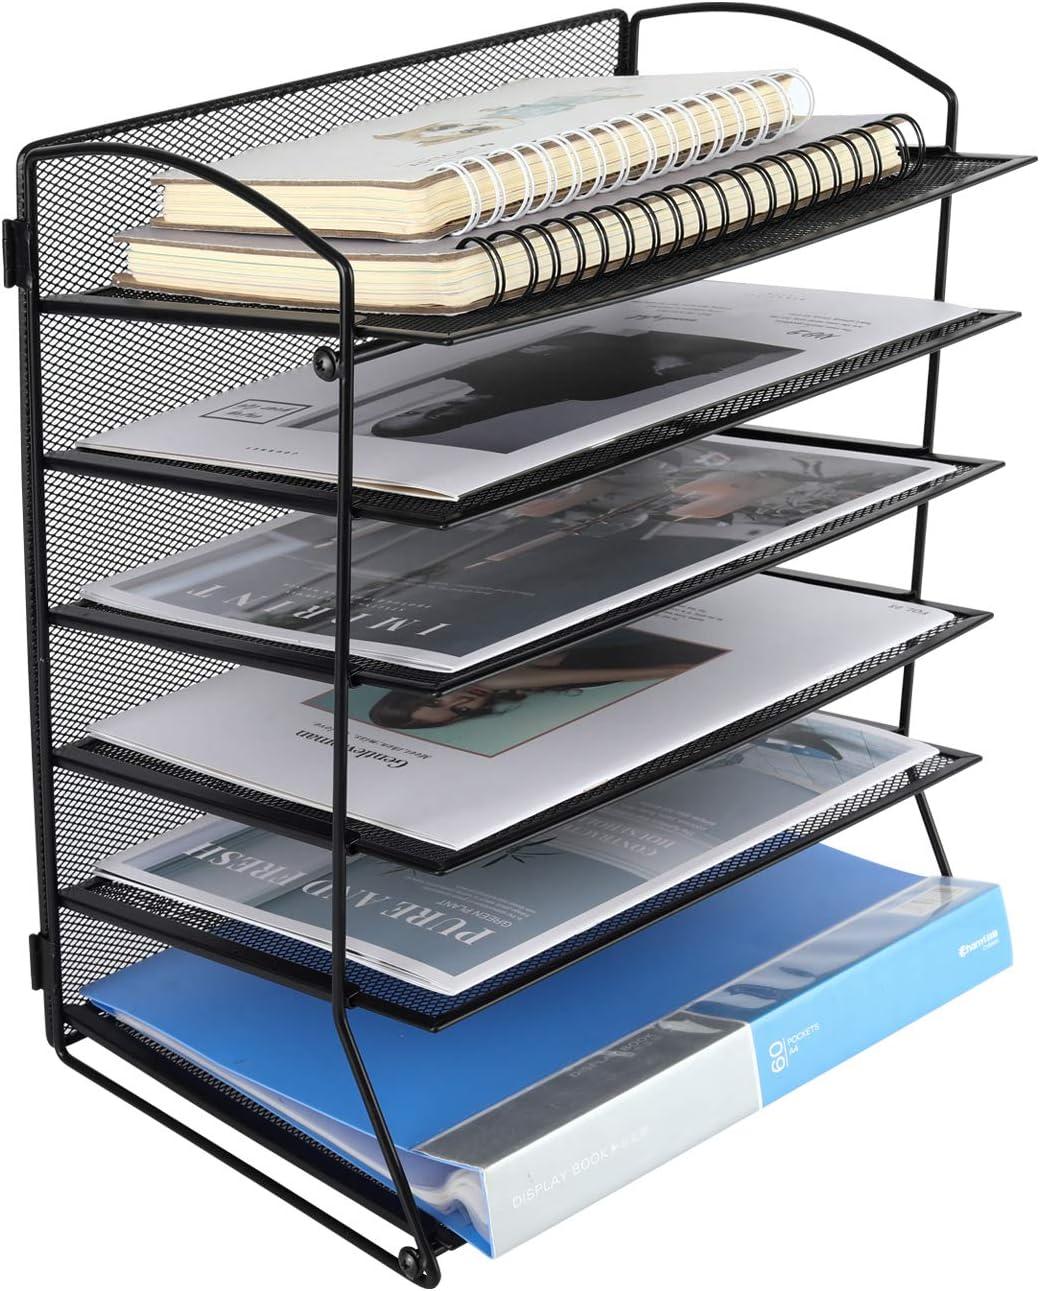 EasyPAG 6 Tier Mesh Desktop File Organizer Document Letter Paper Tray Holder for Office or Home, Black